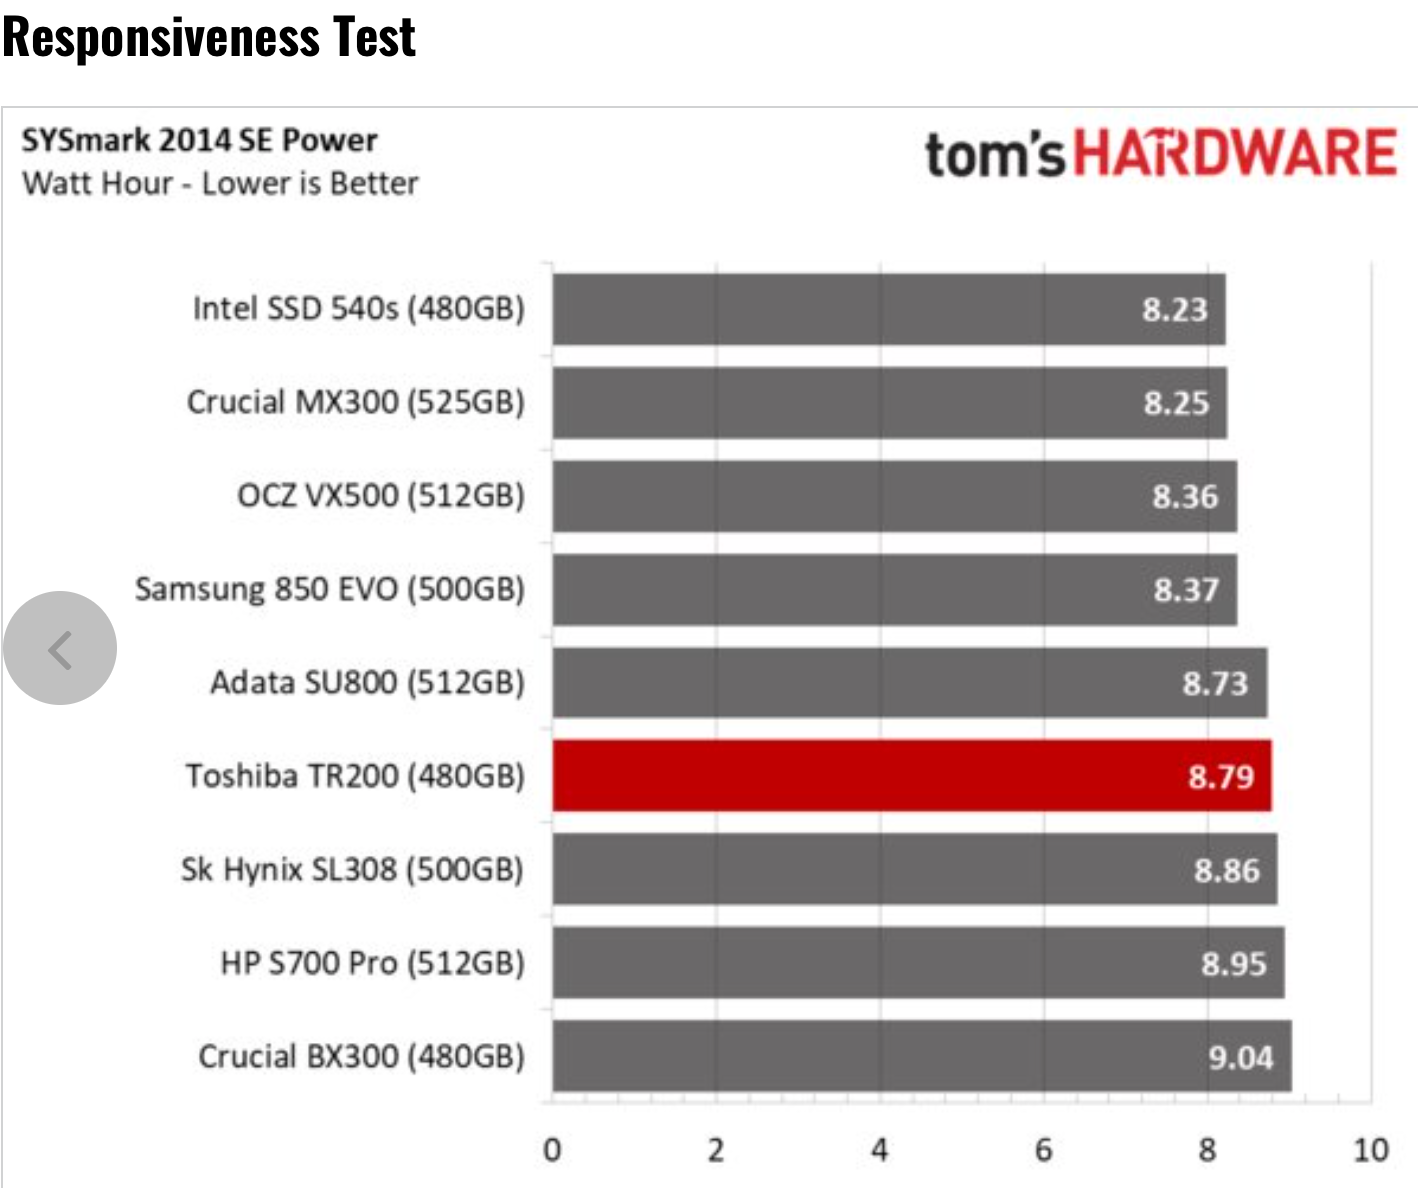 Tom's Hardware – Toshiba TR200 SSD Review using BAPCo's SYSmark 2014 SE Responsiveness + Energy Benchmark Test